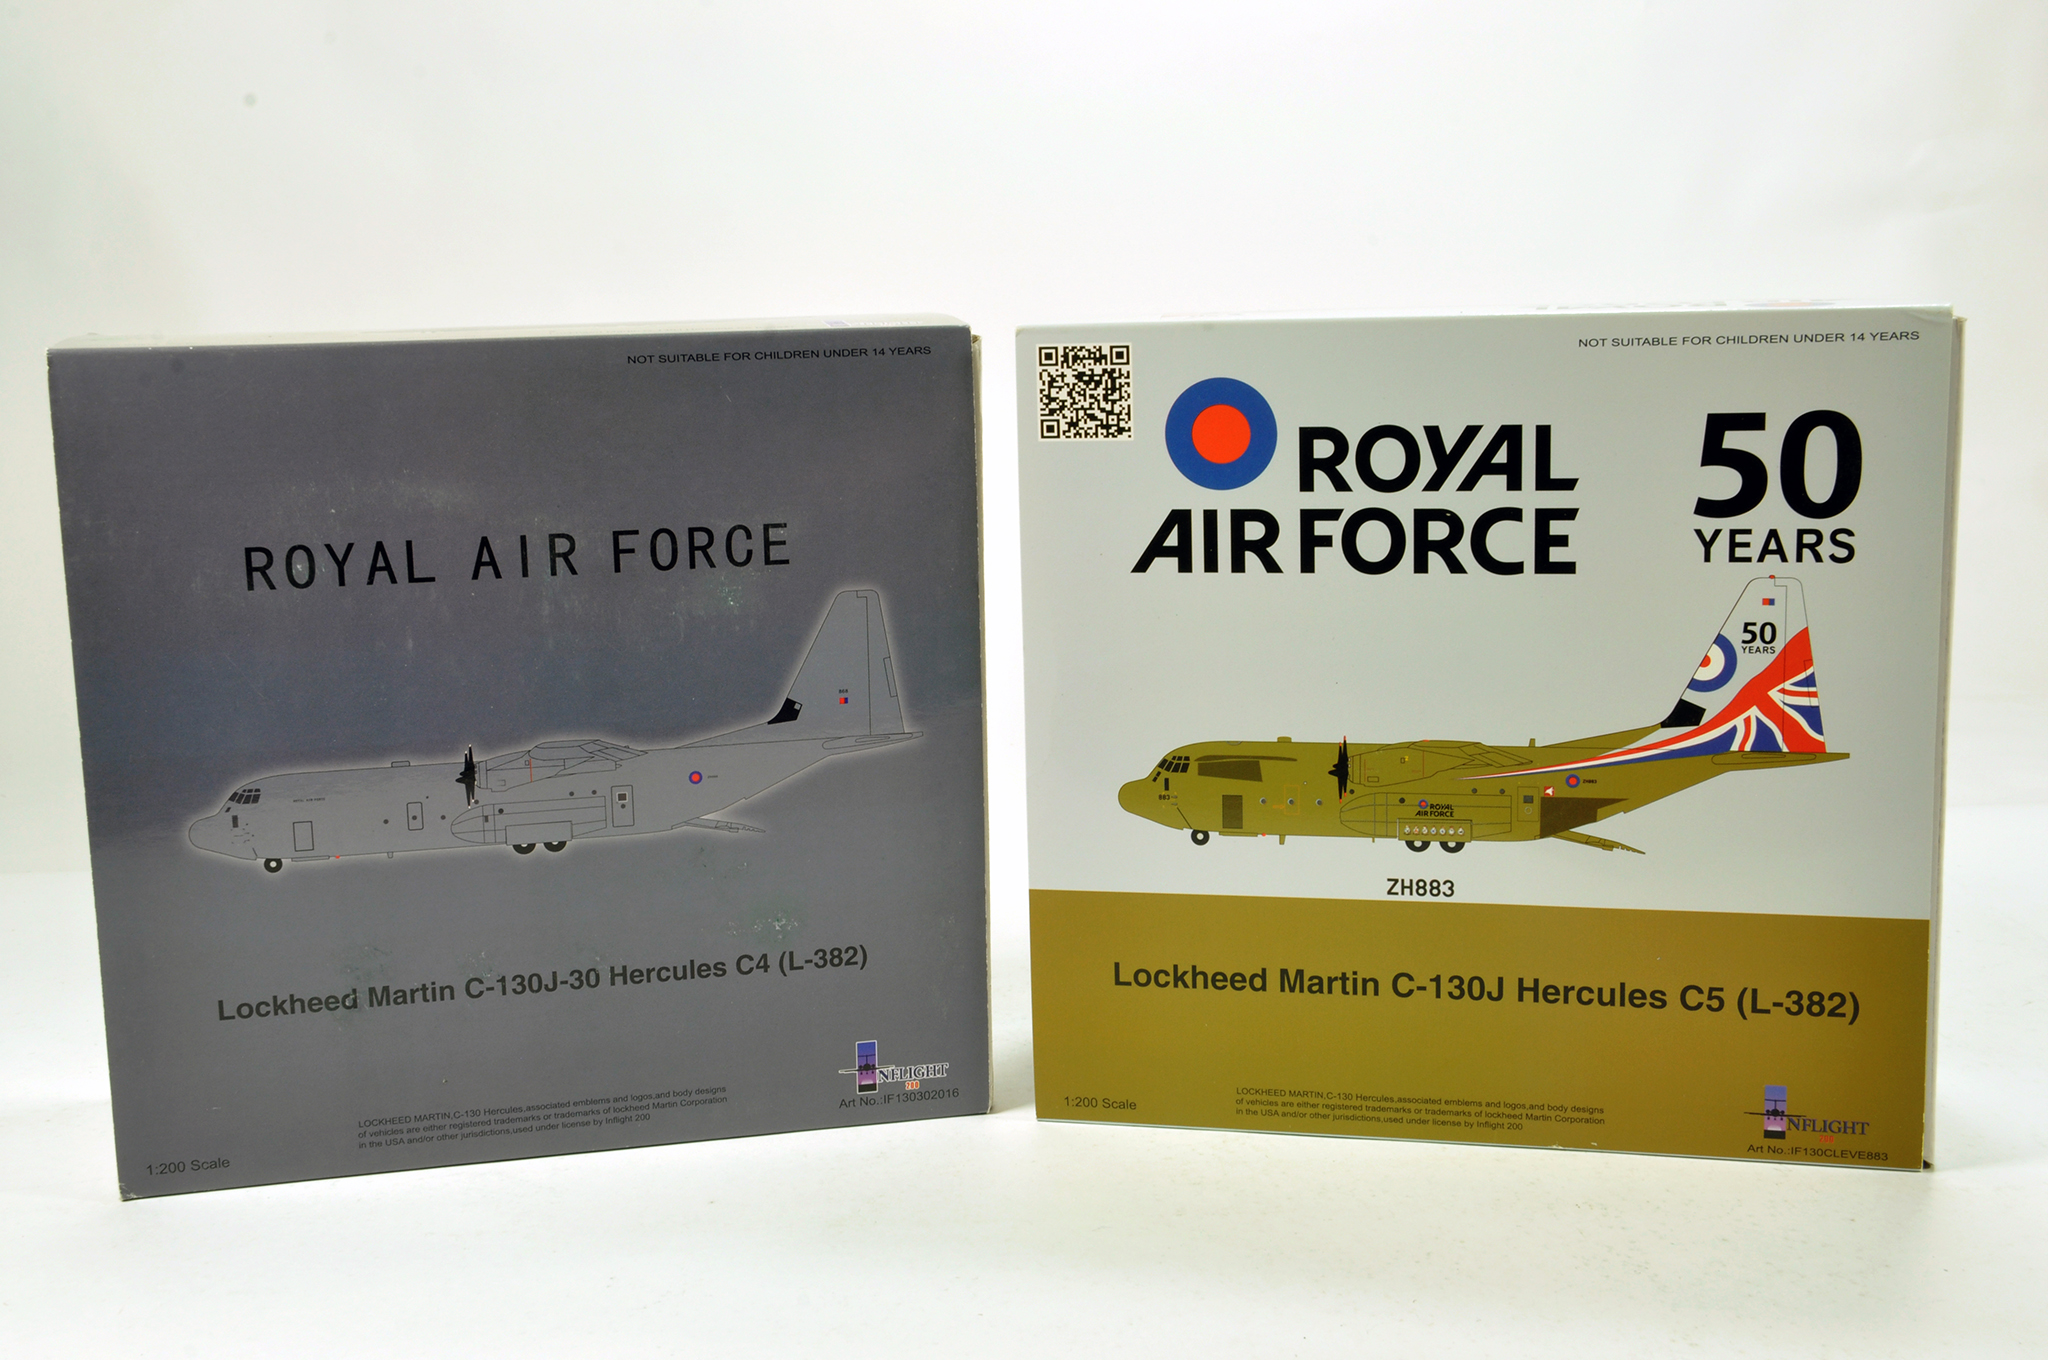 Lot 35 - Inflight Models 1/200 Diecast Aircraft Models comprising Lockheed Martin hercules issues in RAF